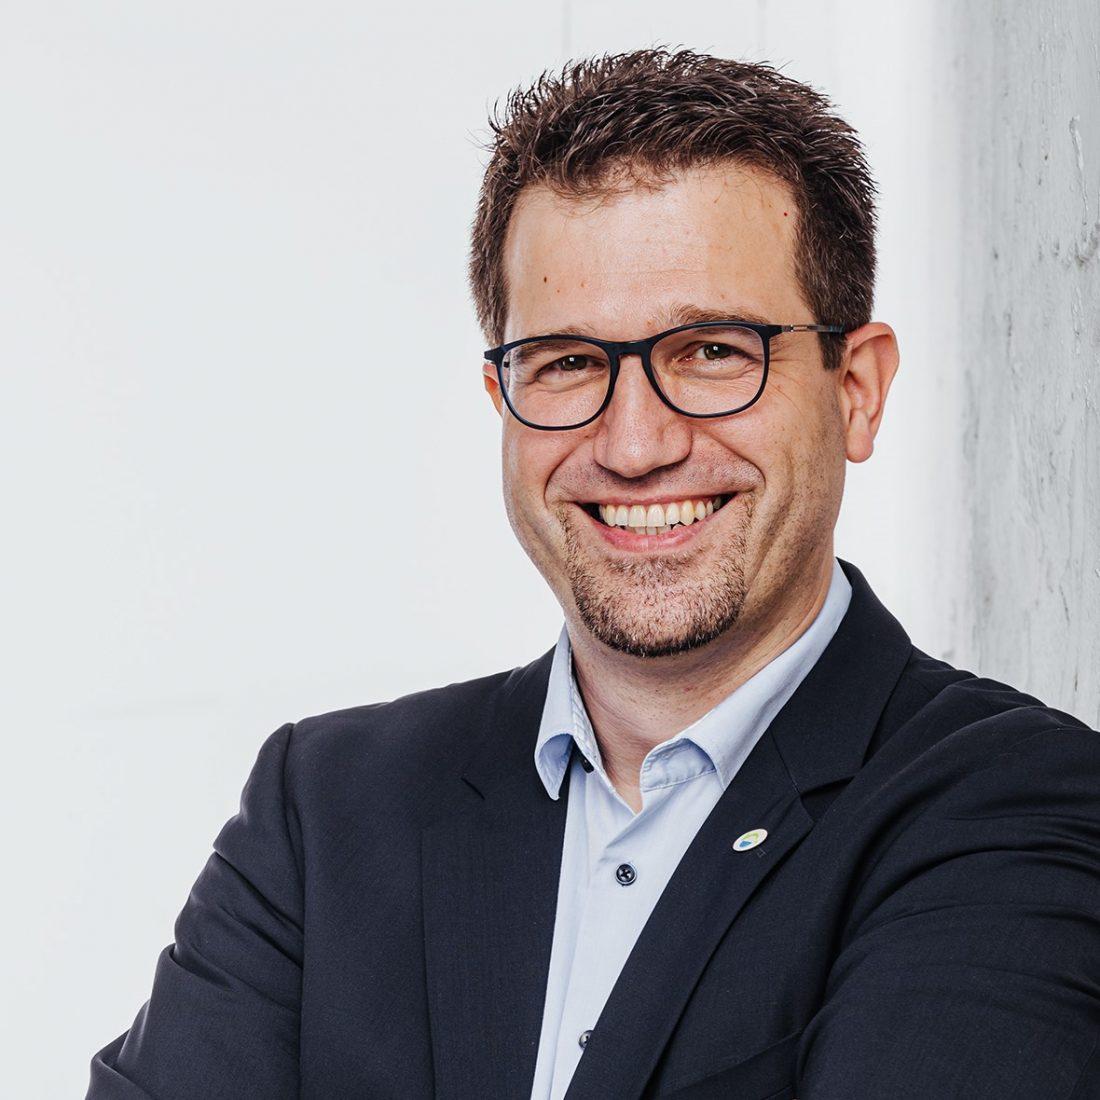 Christian Küsters